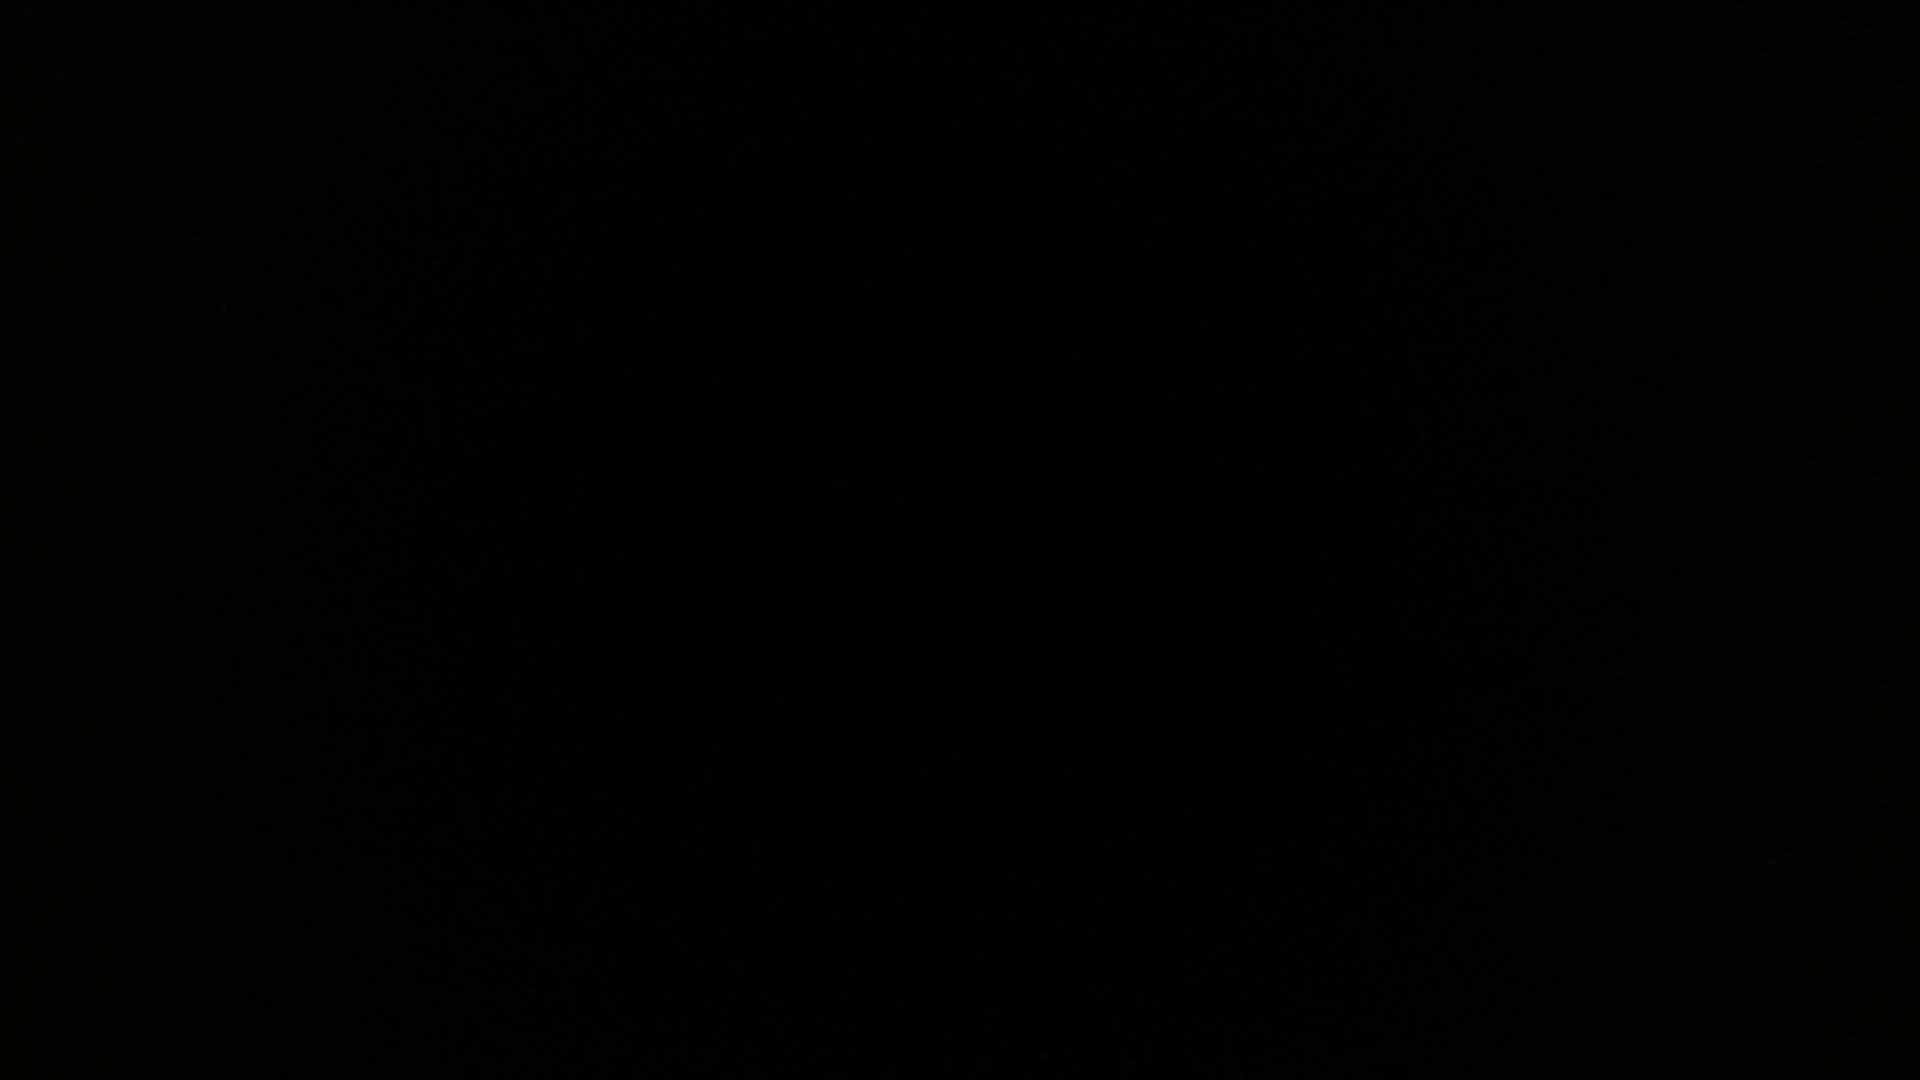 SPYさん初投稿!マンション覗き!5000K!ハイビジョン撮影VOL.03(元野球部社会人編) 完全無修正  109pic 49